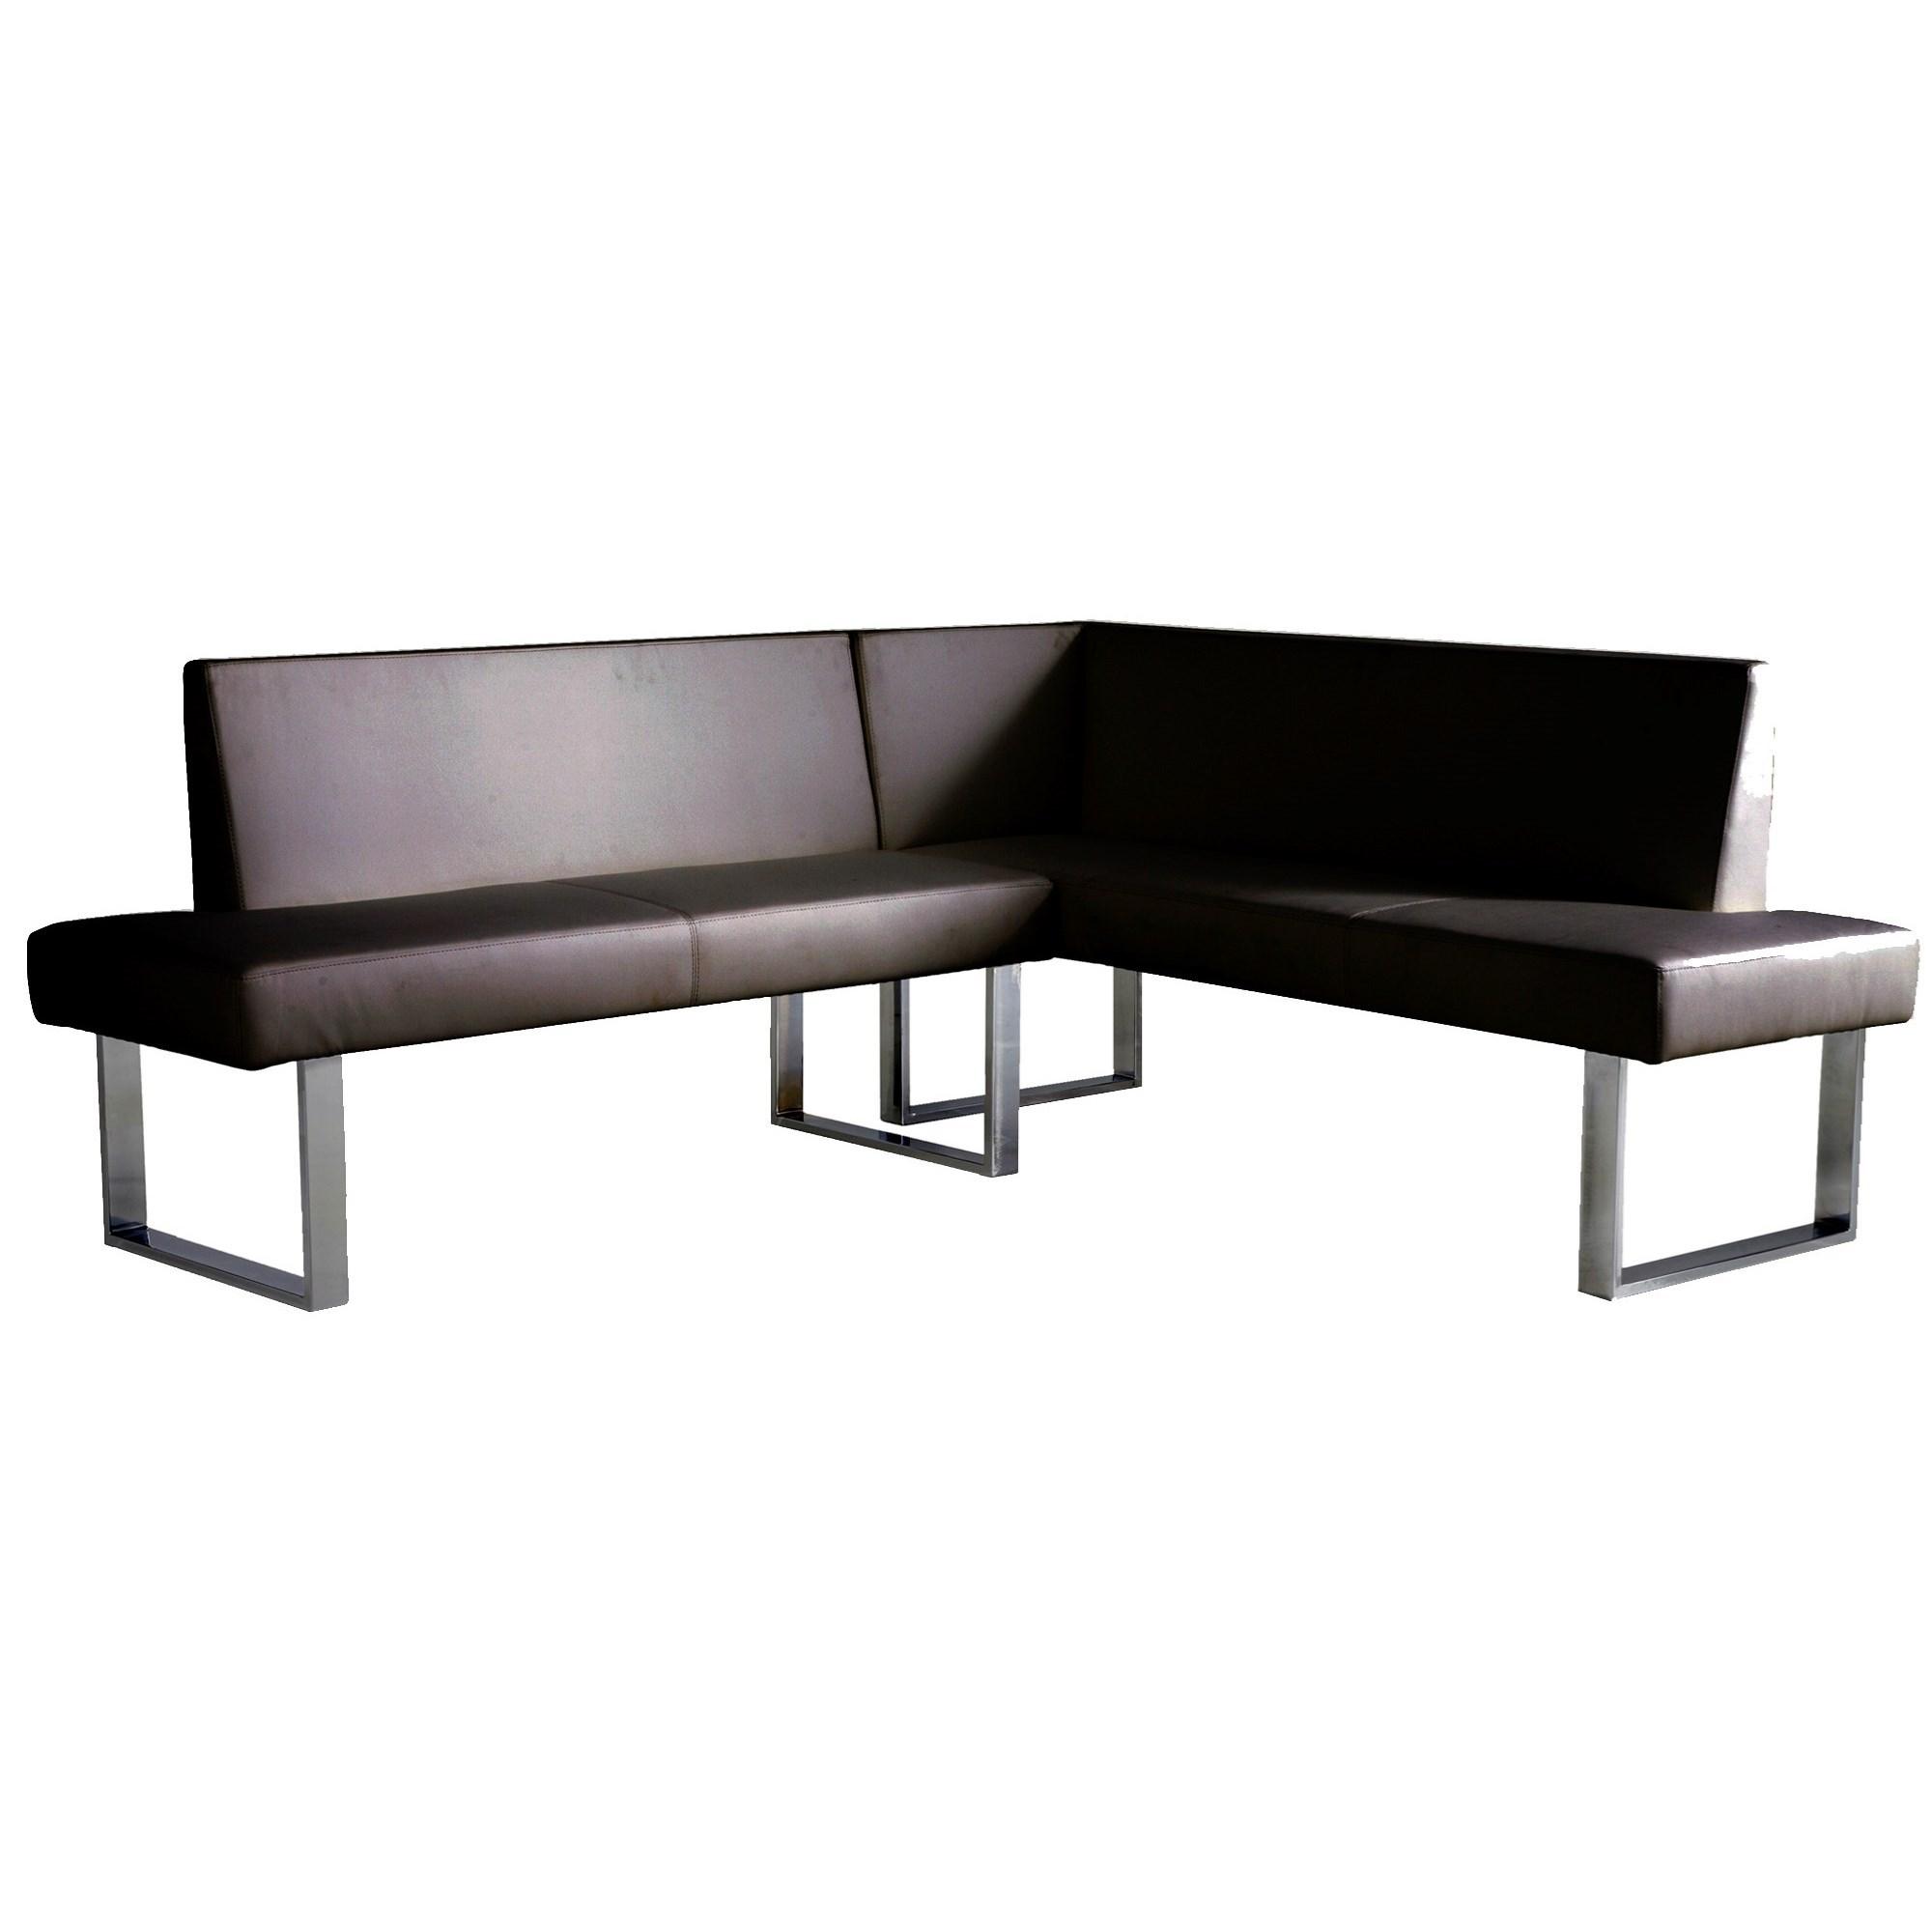 Nook Corner Dining Bench